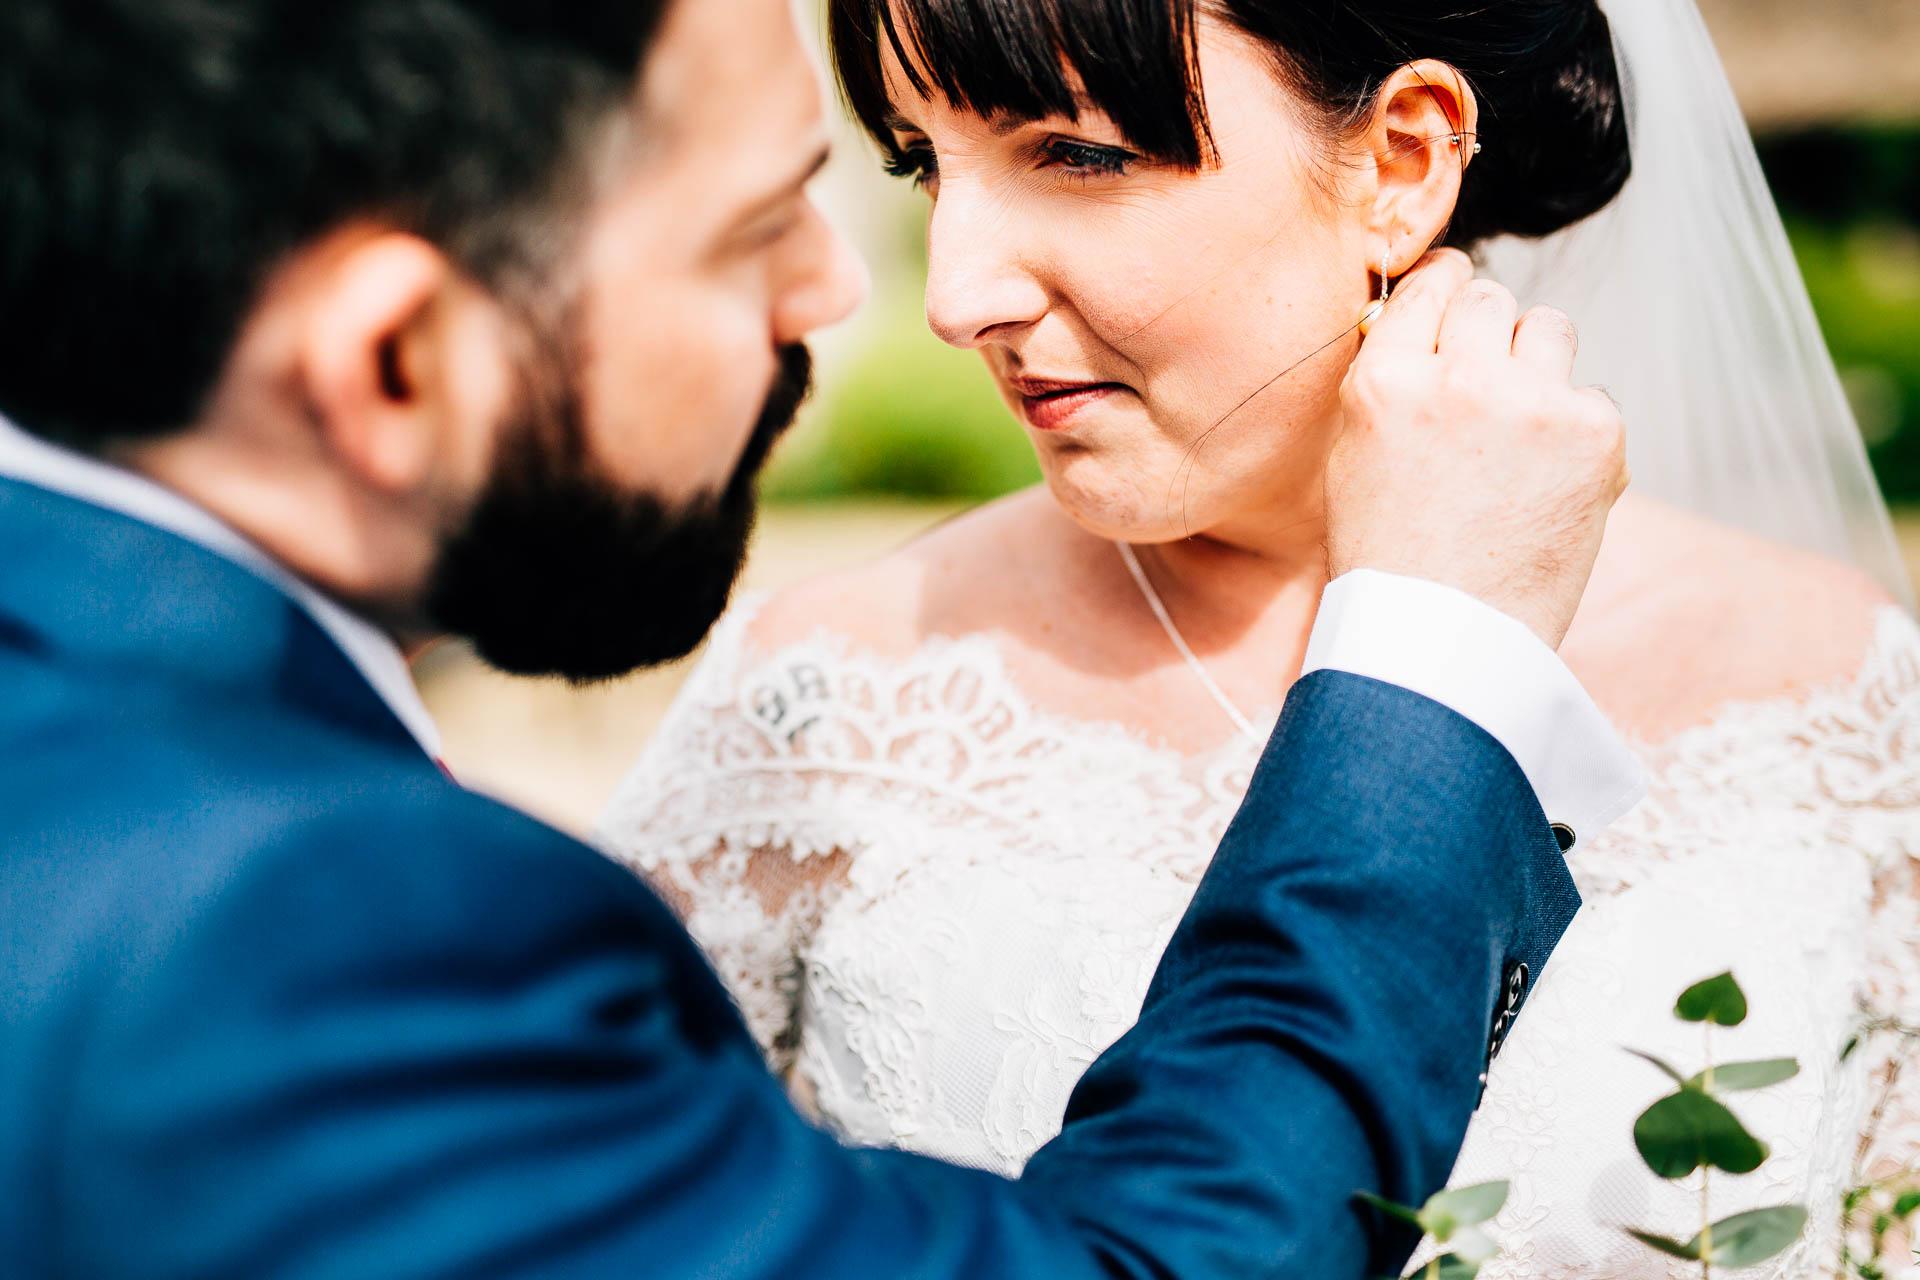 Caswell House Wedding Photography - Emma & Pete-87